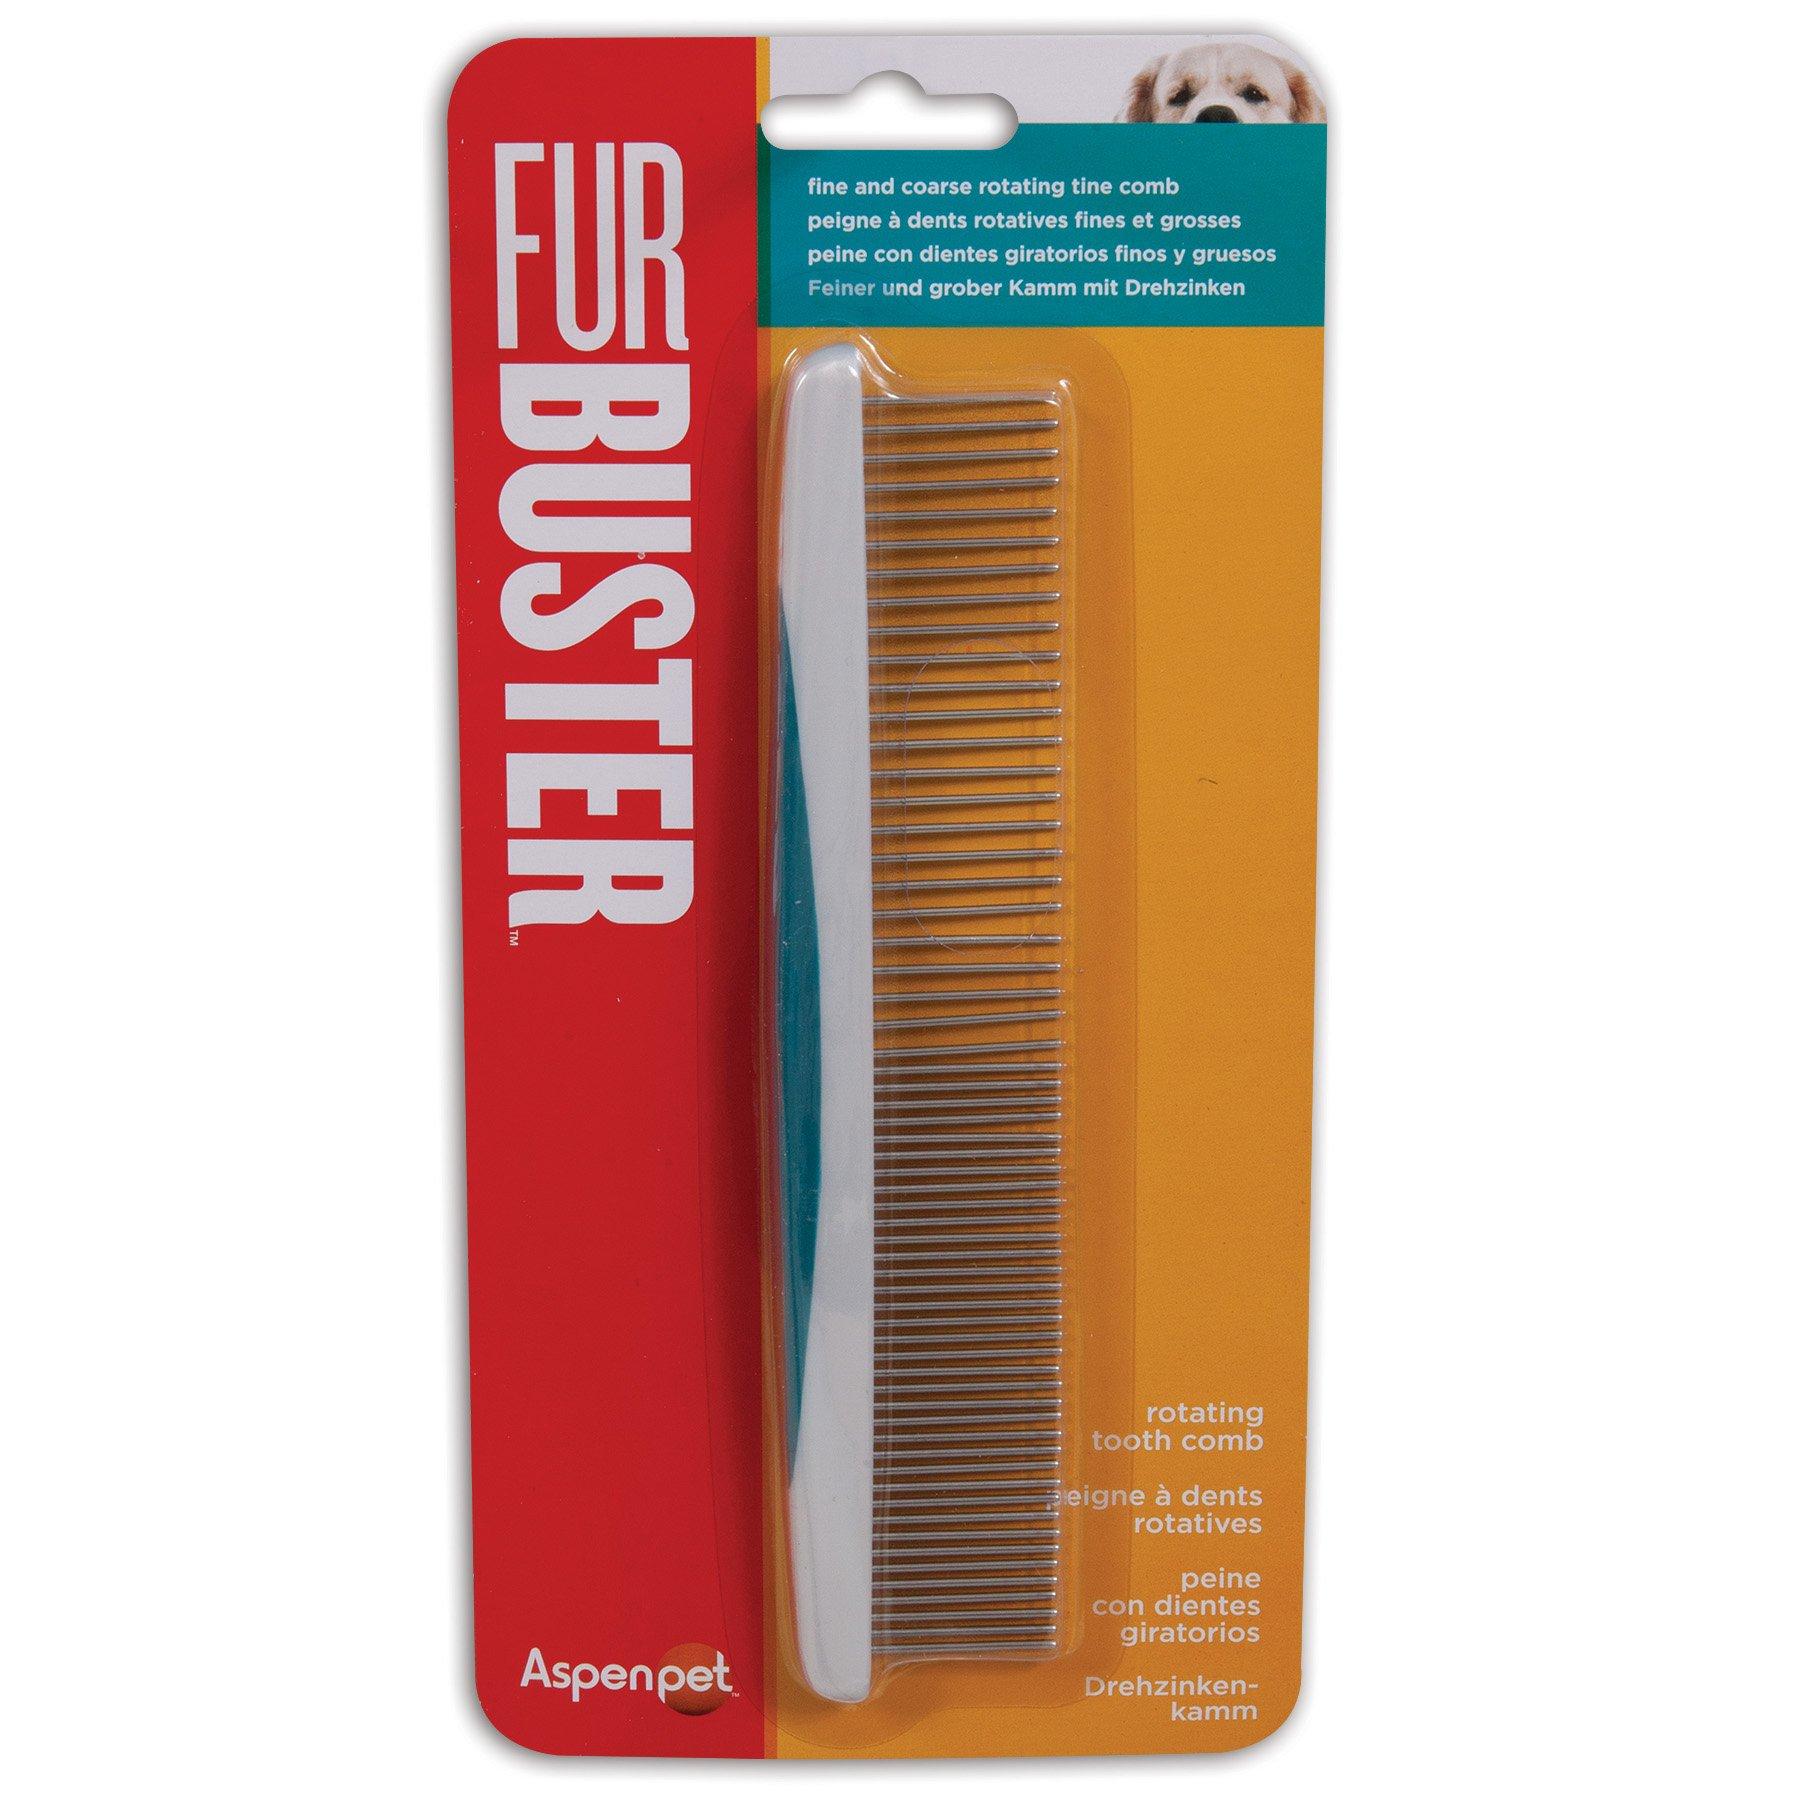 Petmate Furbuster Rotating Tooth Comb, Vibrant Plum by Petmate (Image #2)